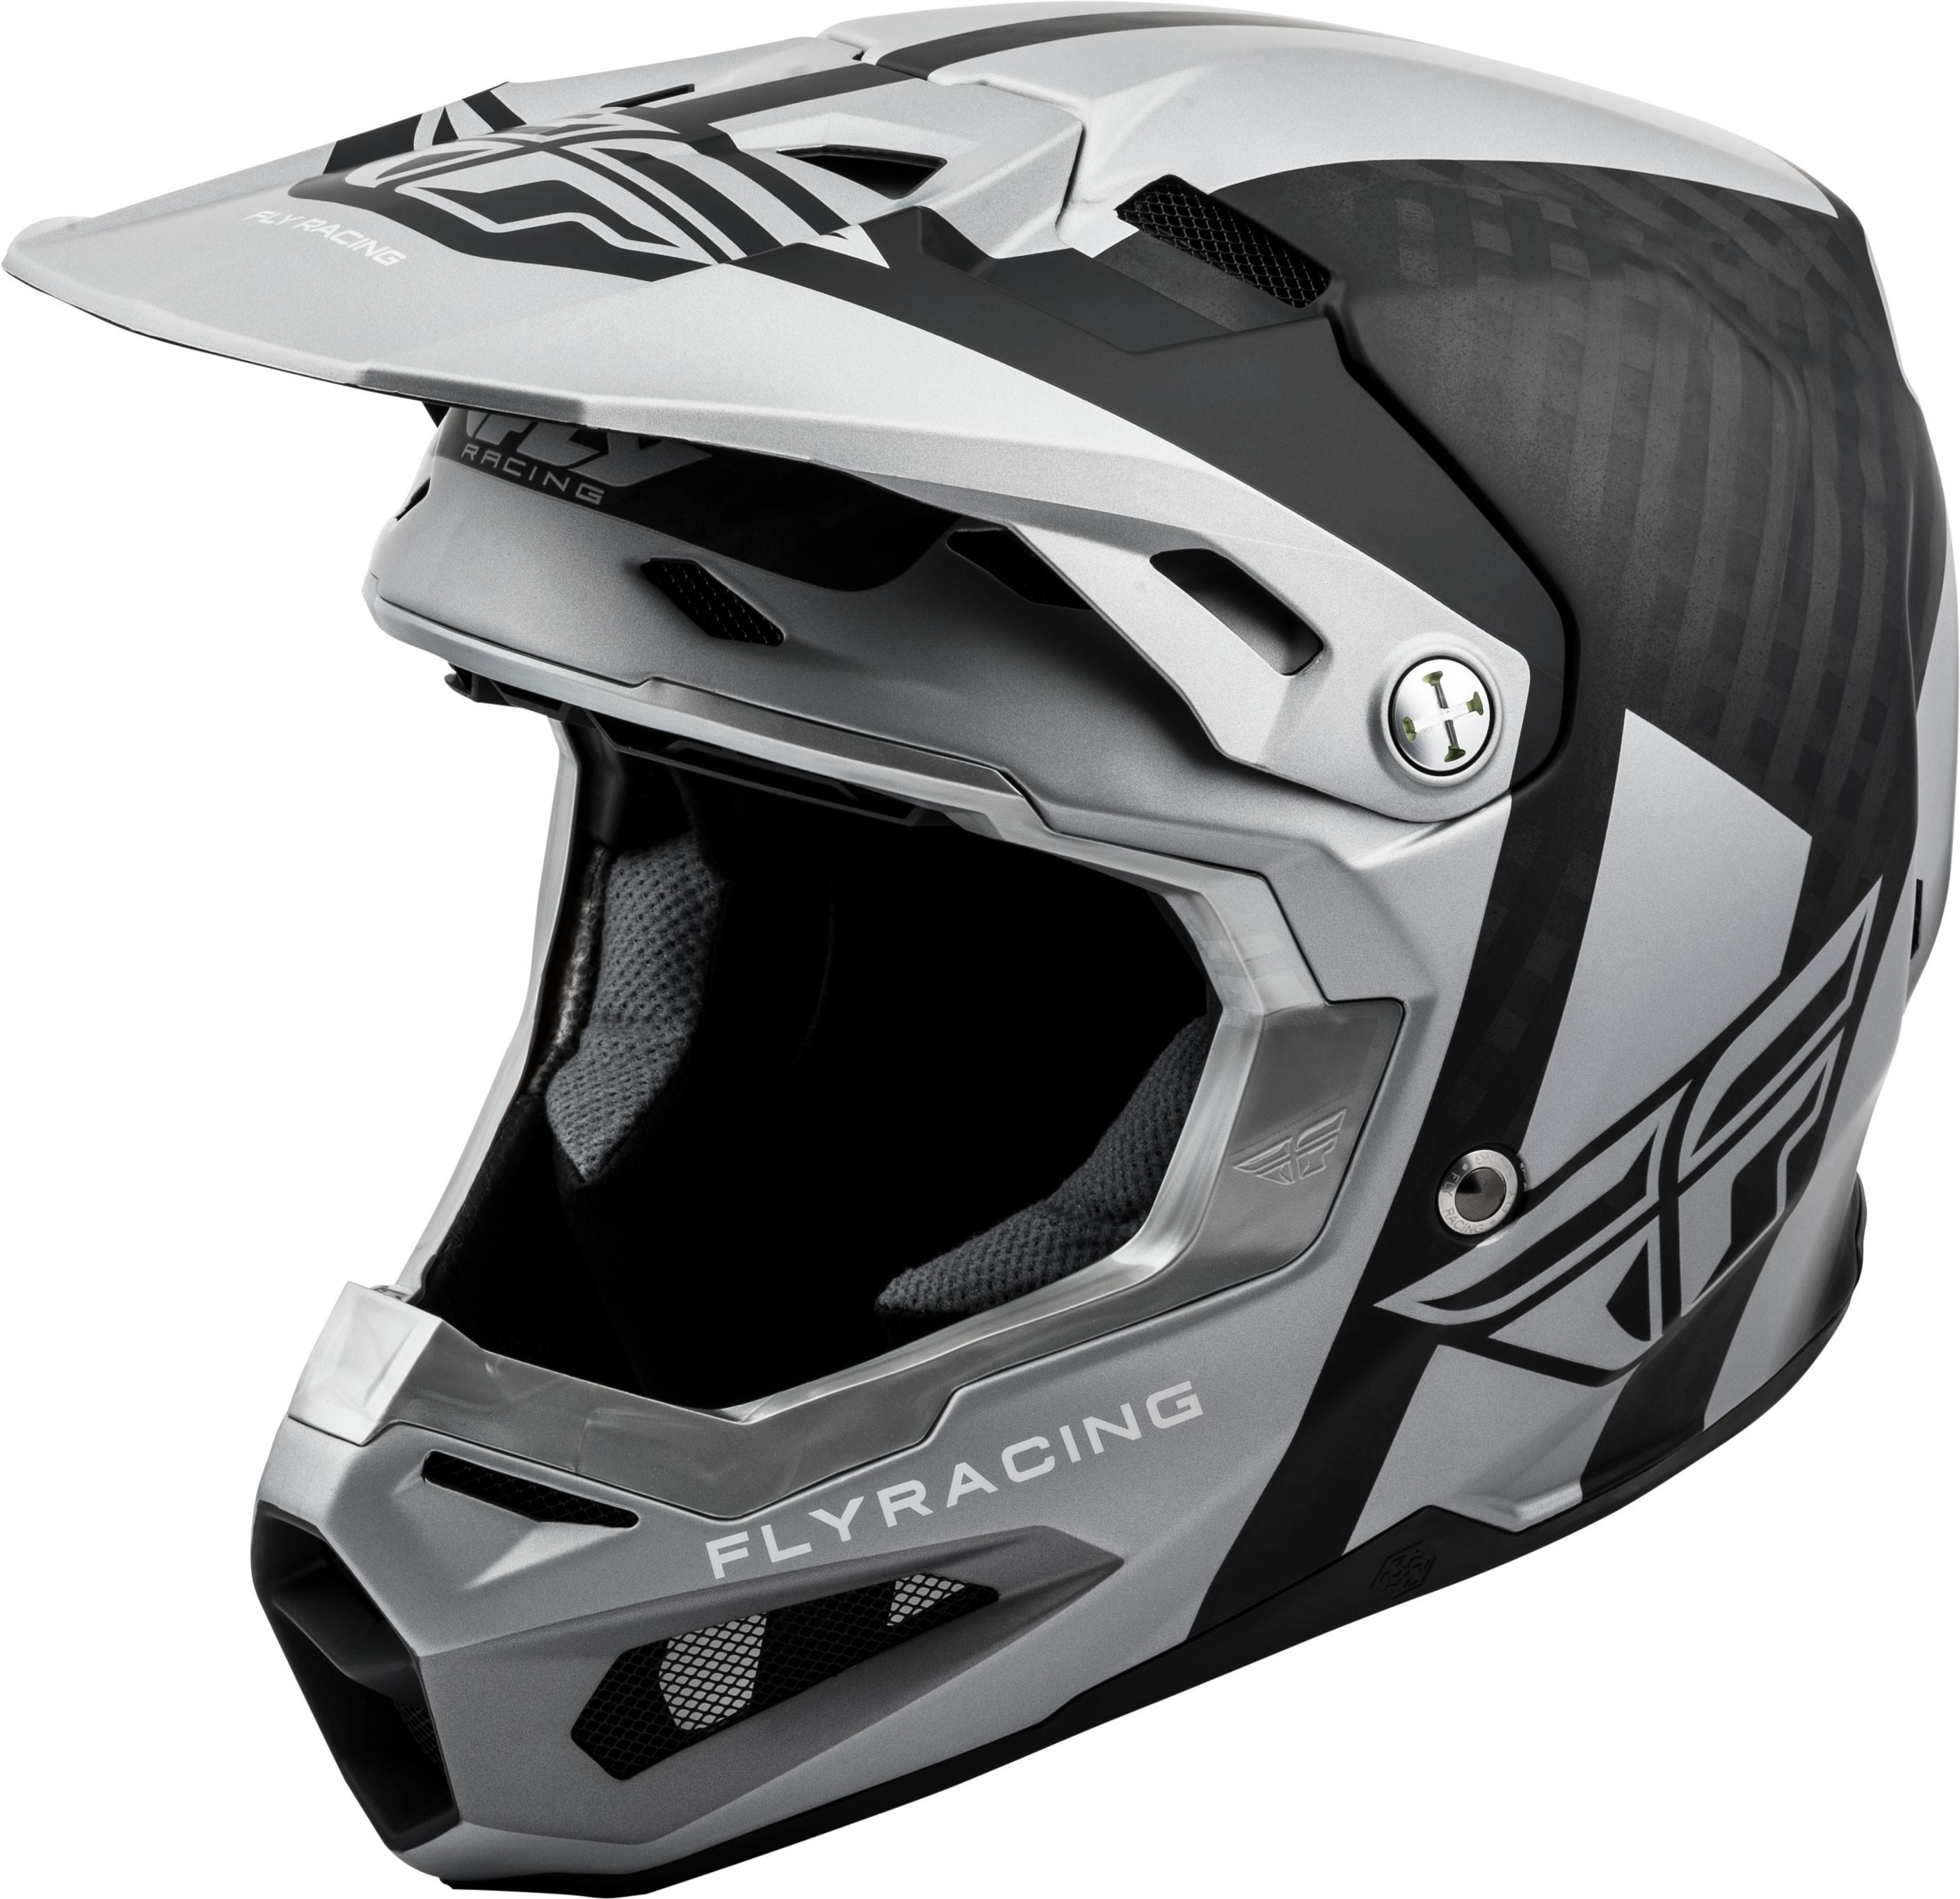 FORMULA ORIGIN Helmet Matte,  Black Silver MD 73-4405M